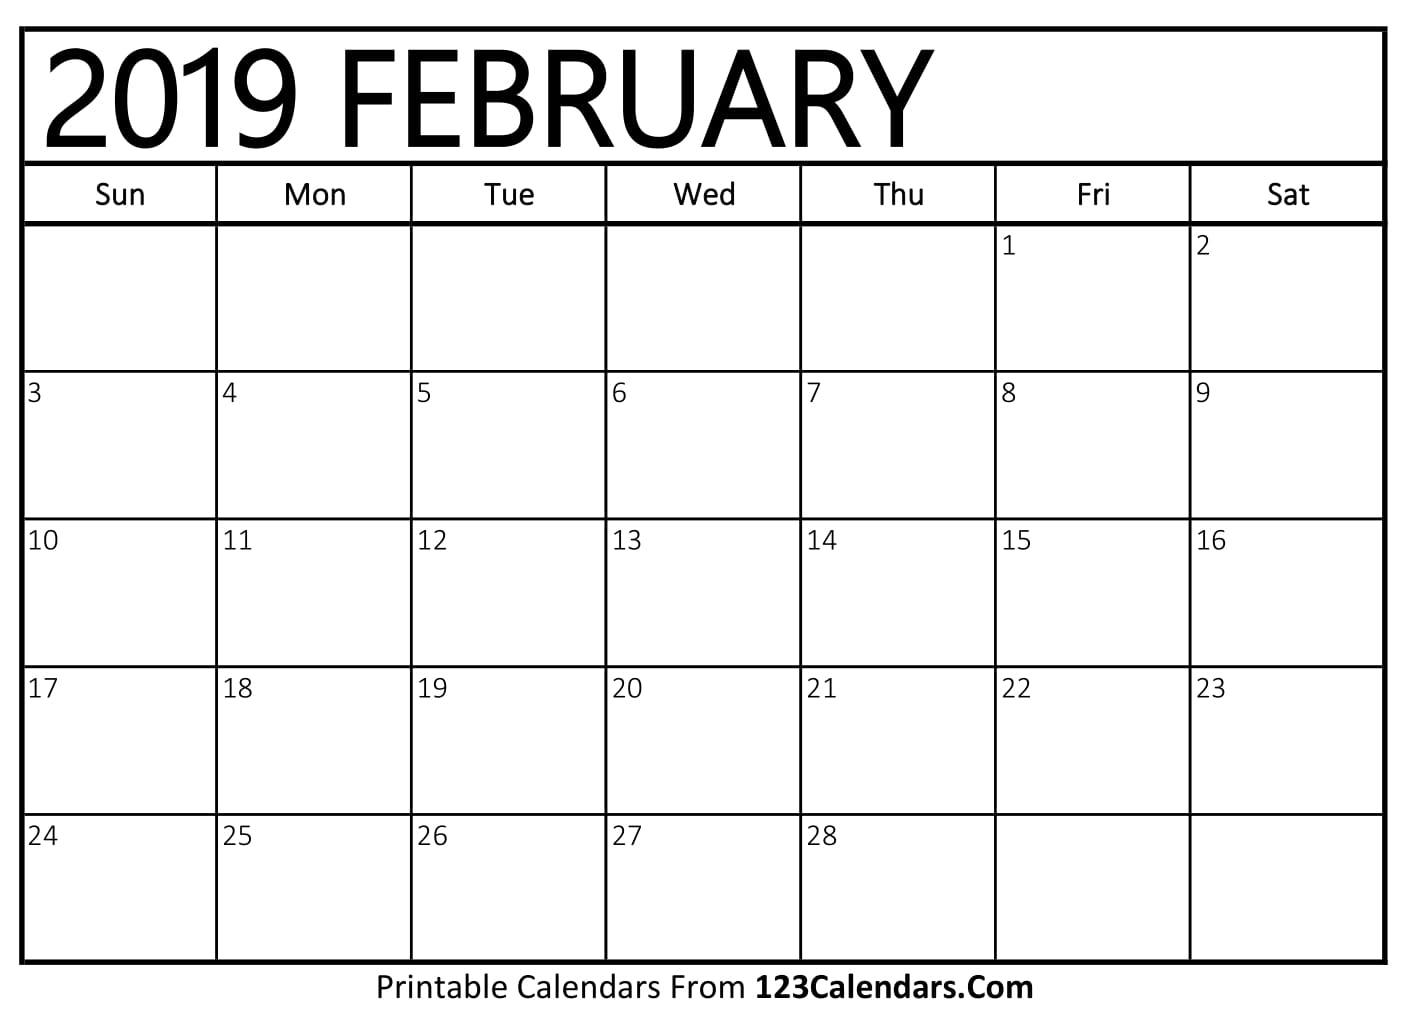 February 2019 Calendar Blank Easily Printable 123calendars